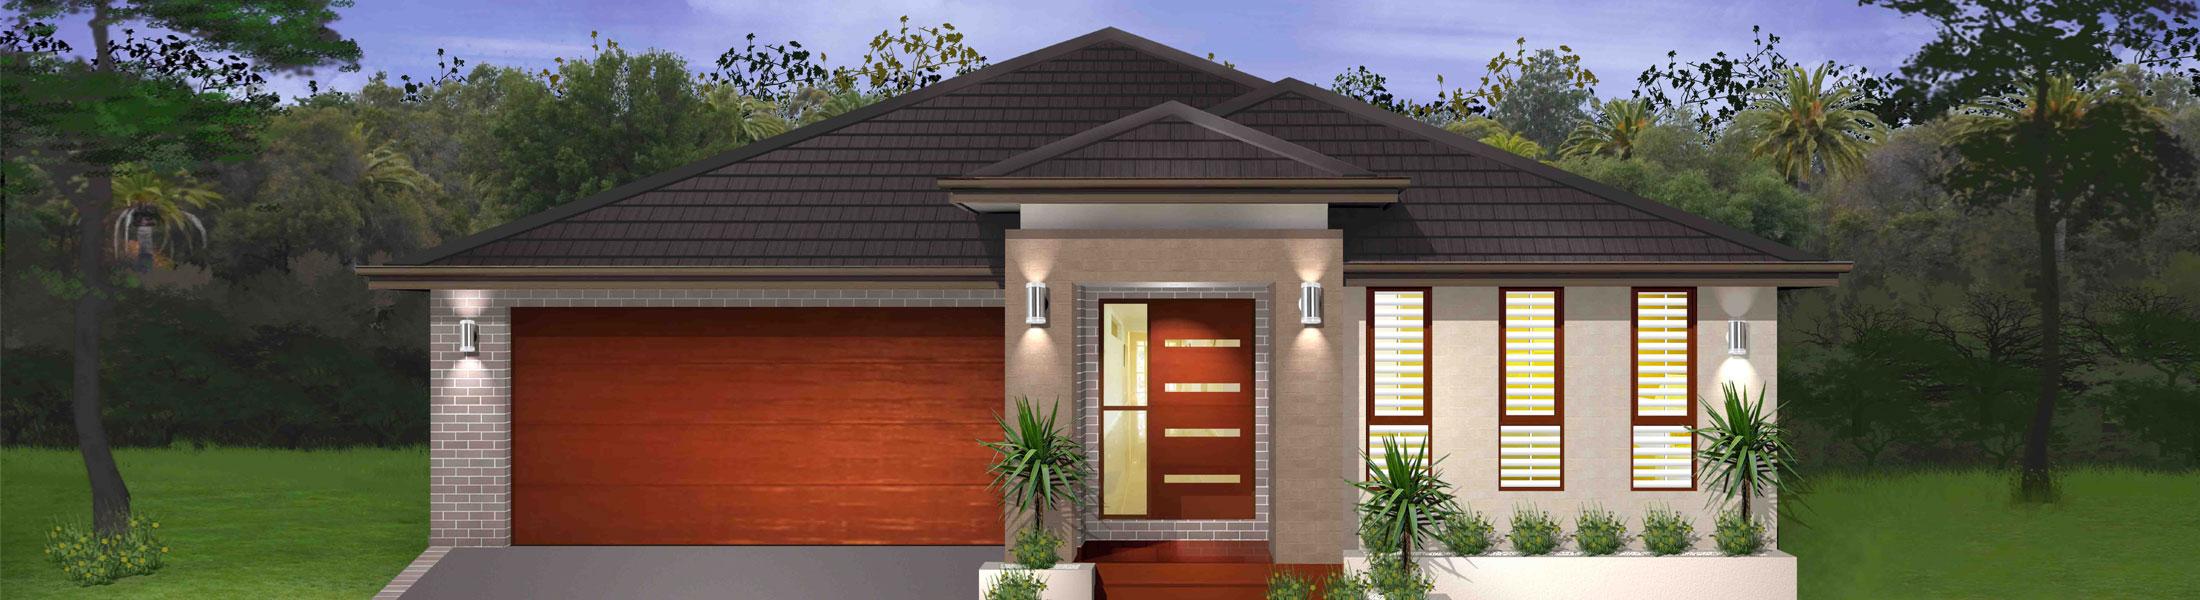 Sandy Bay Home Design - Single Storey   Marksman Homes - Illawarra Home Builder